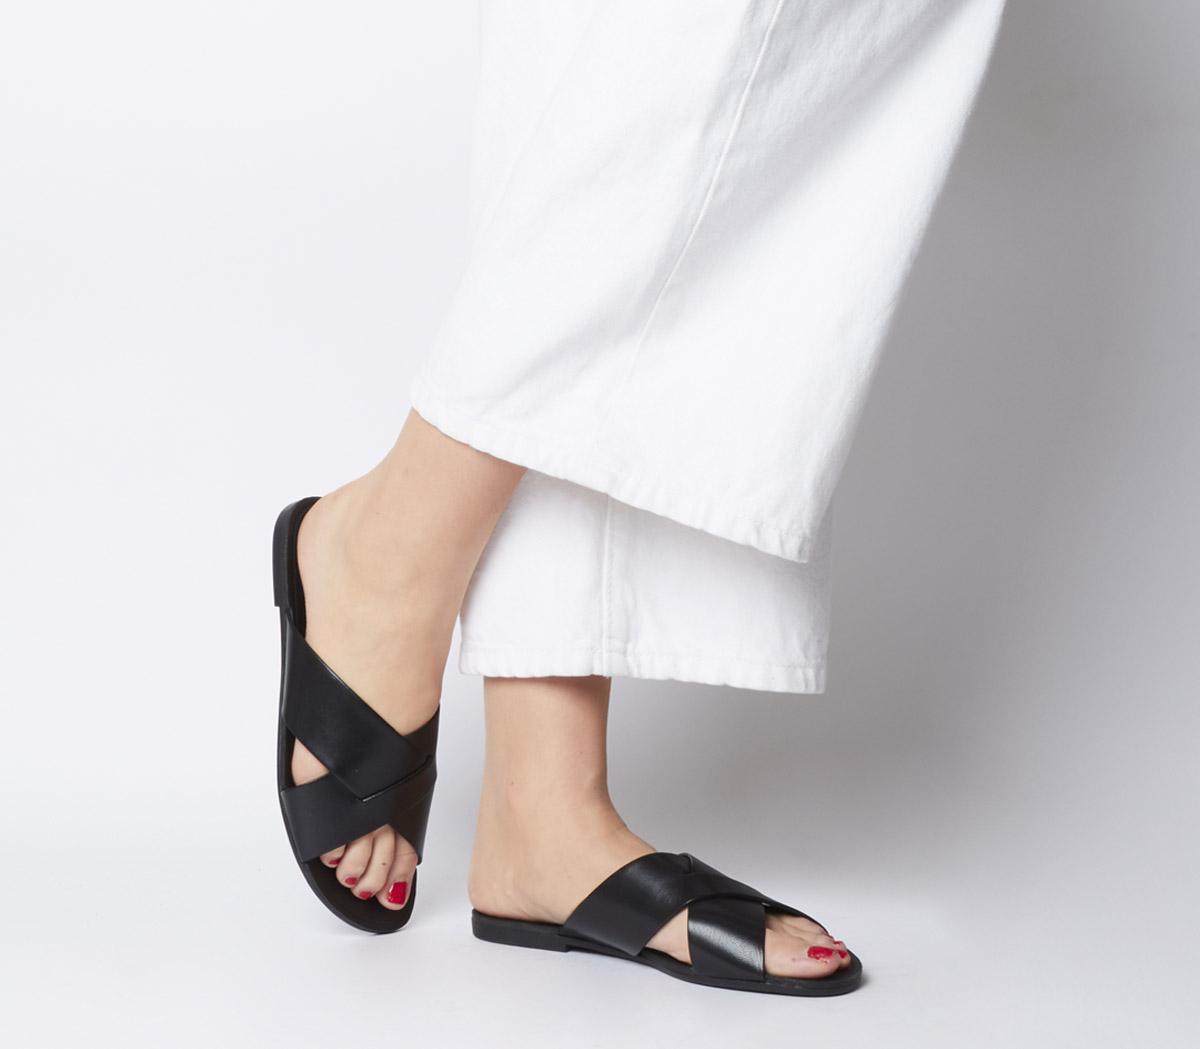 Tia Cross Sandals